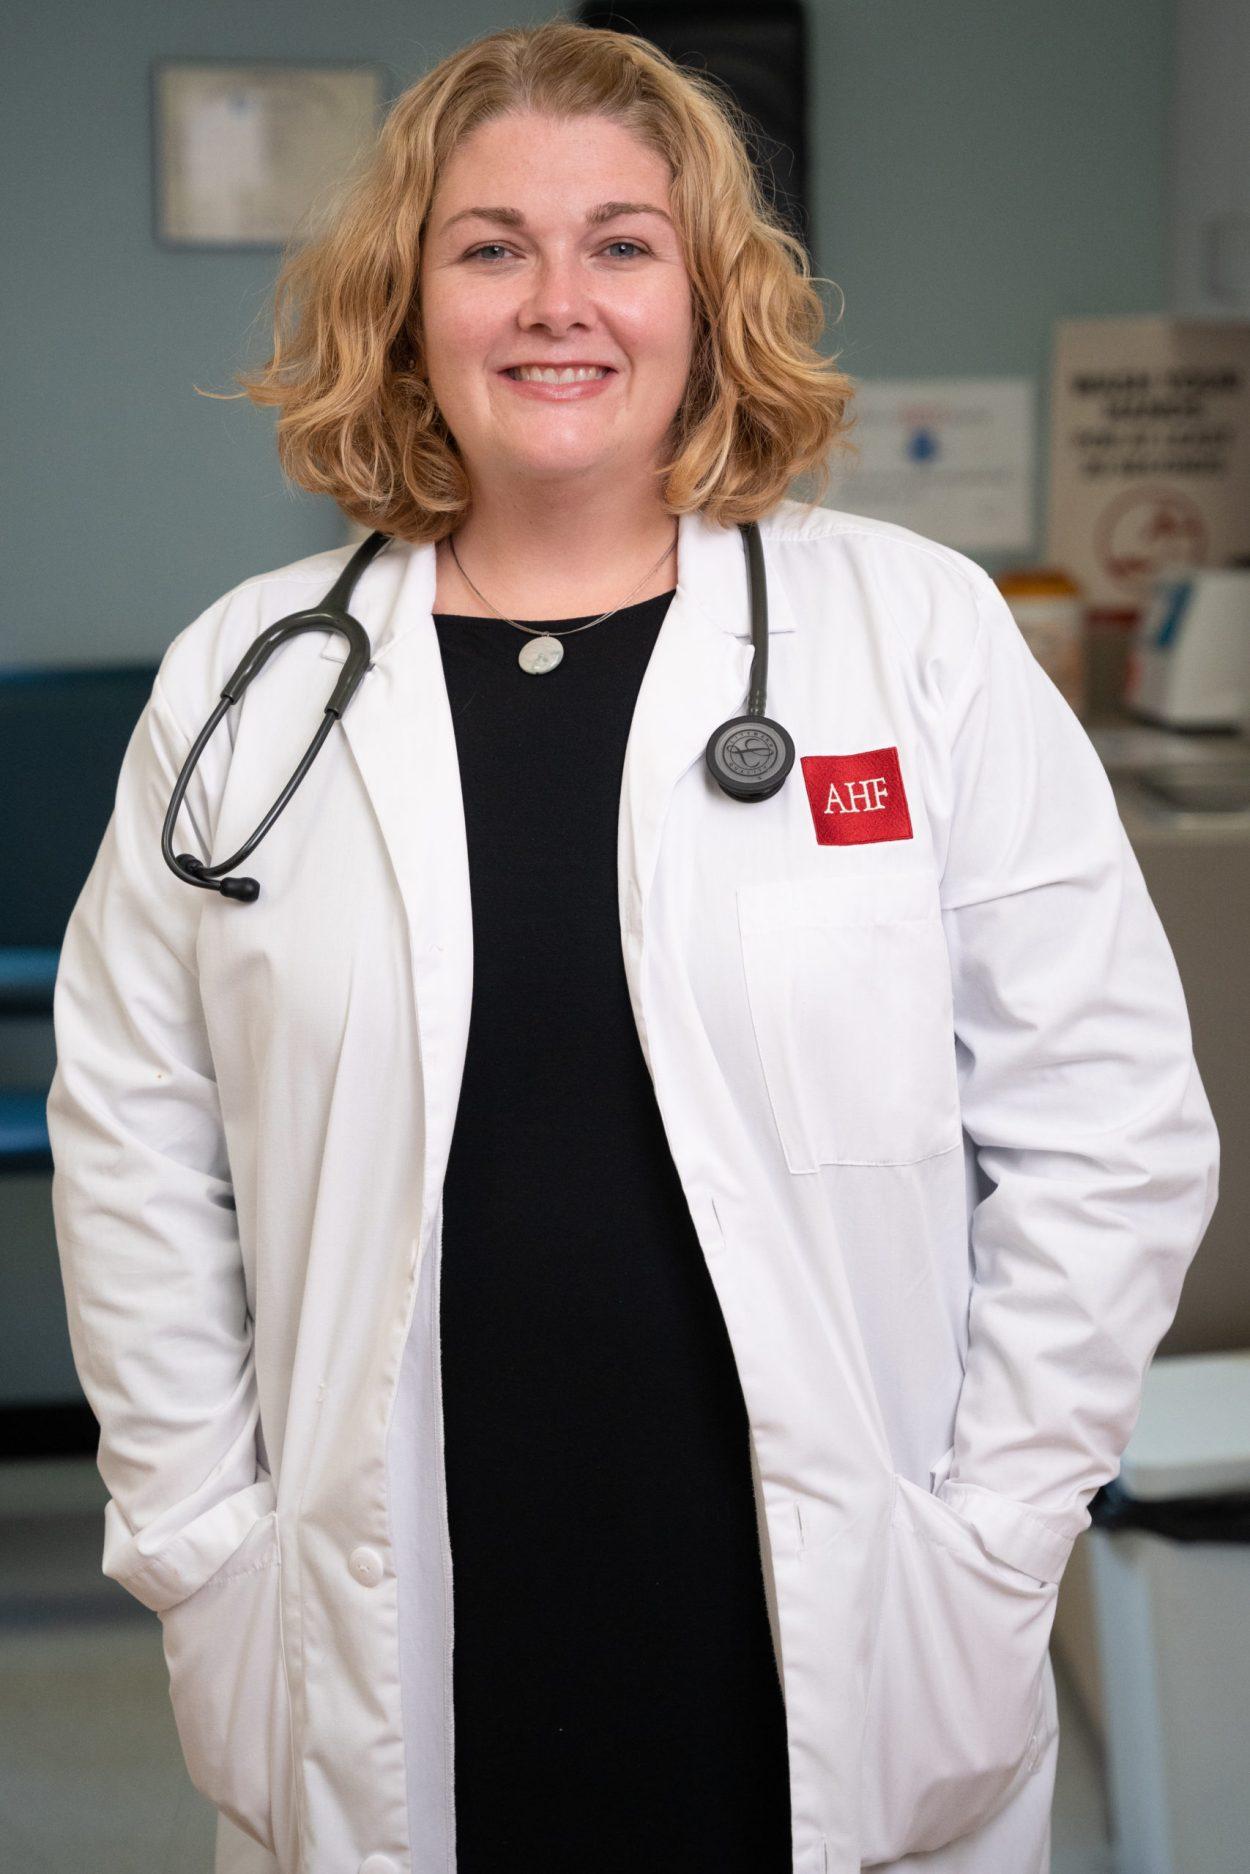 Dr. Gina Simoncini, M.D.